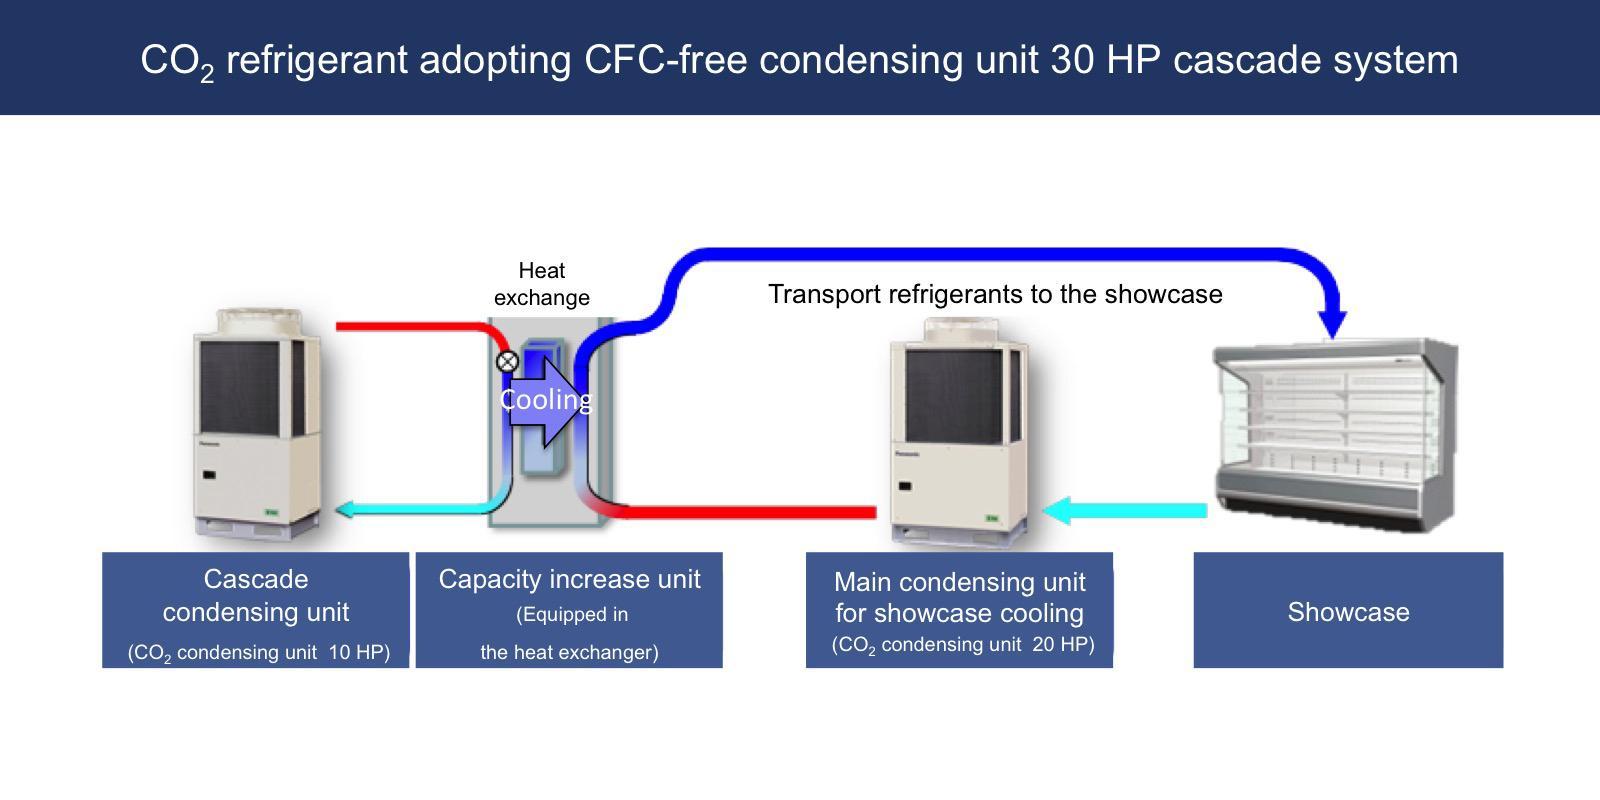 image: panasonic's CO2 refrigerant CFC-free freezer 30 HP cascade system